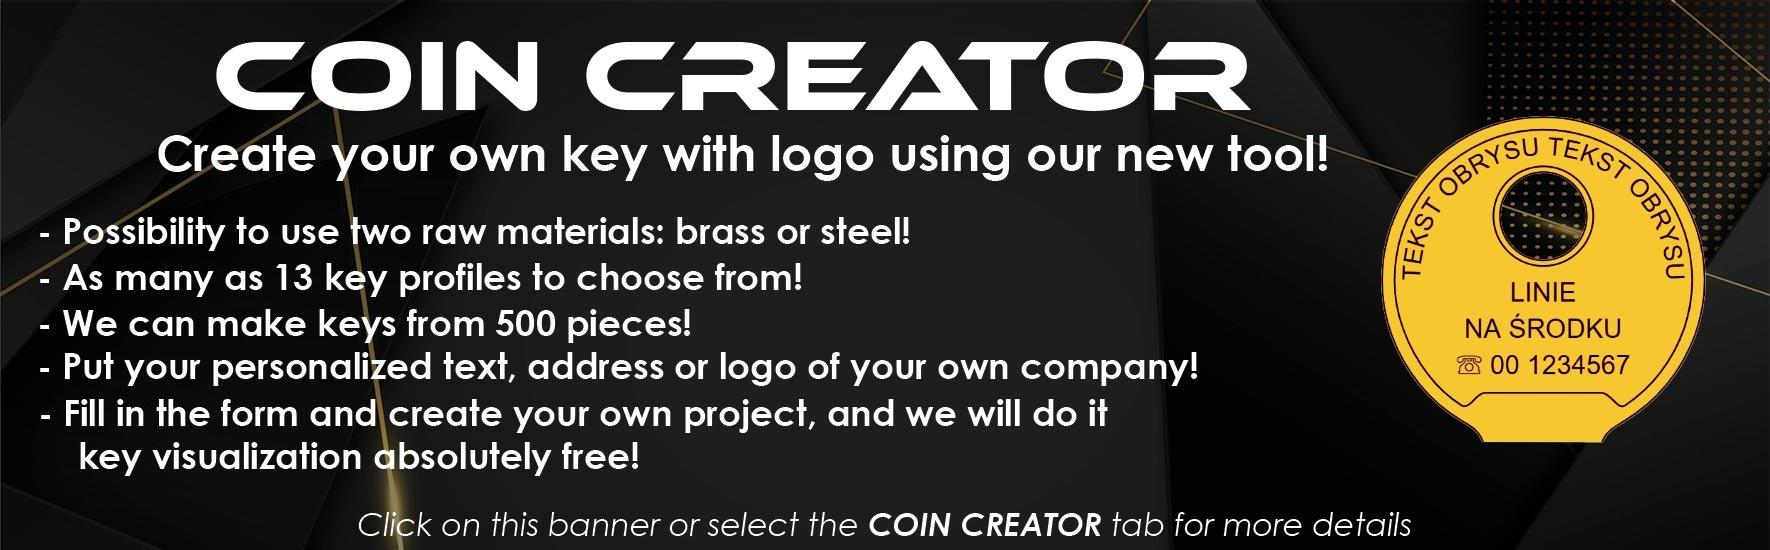 Coin Creator